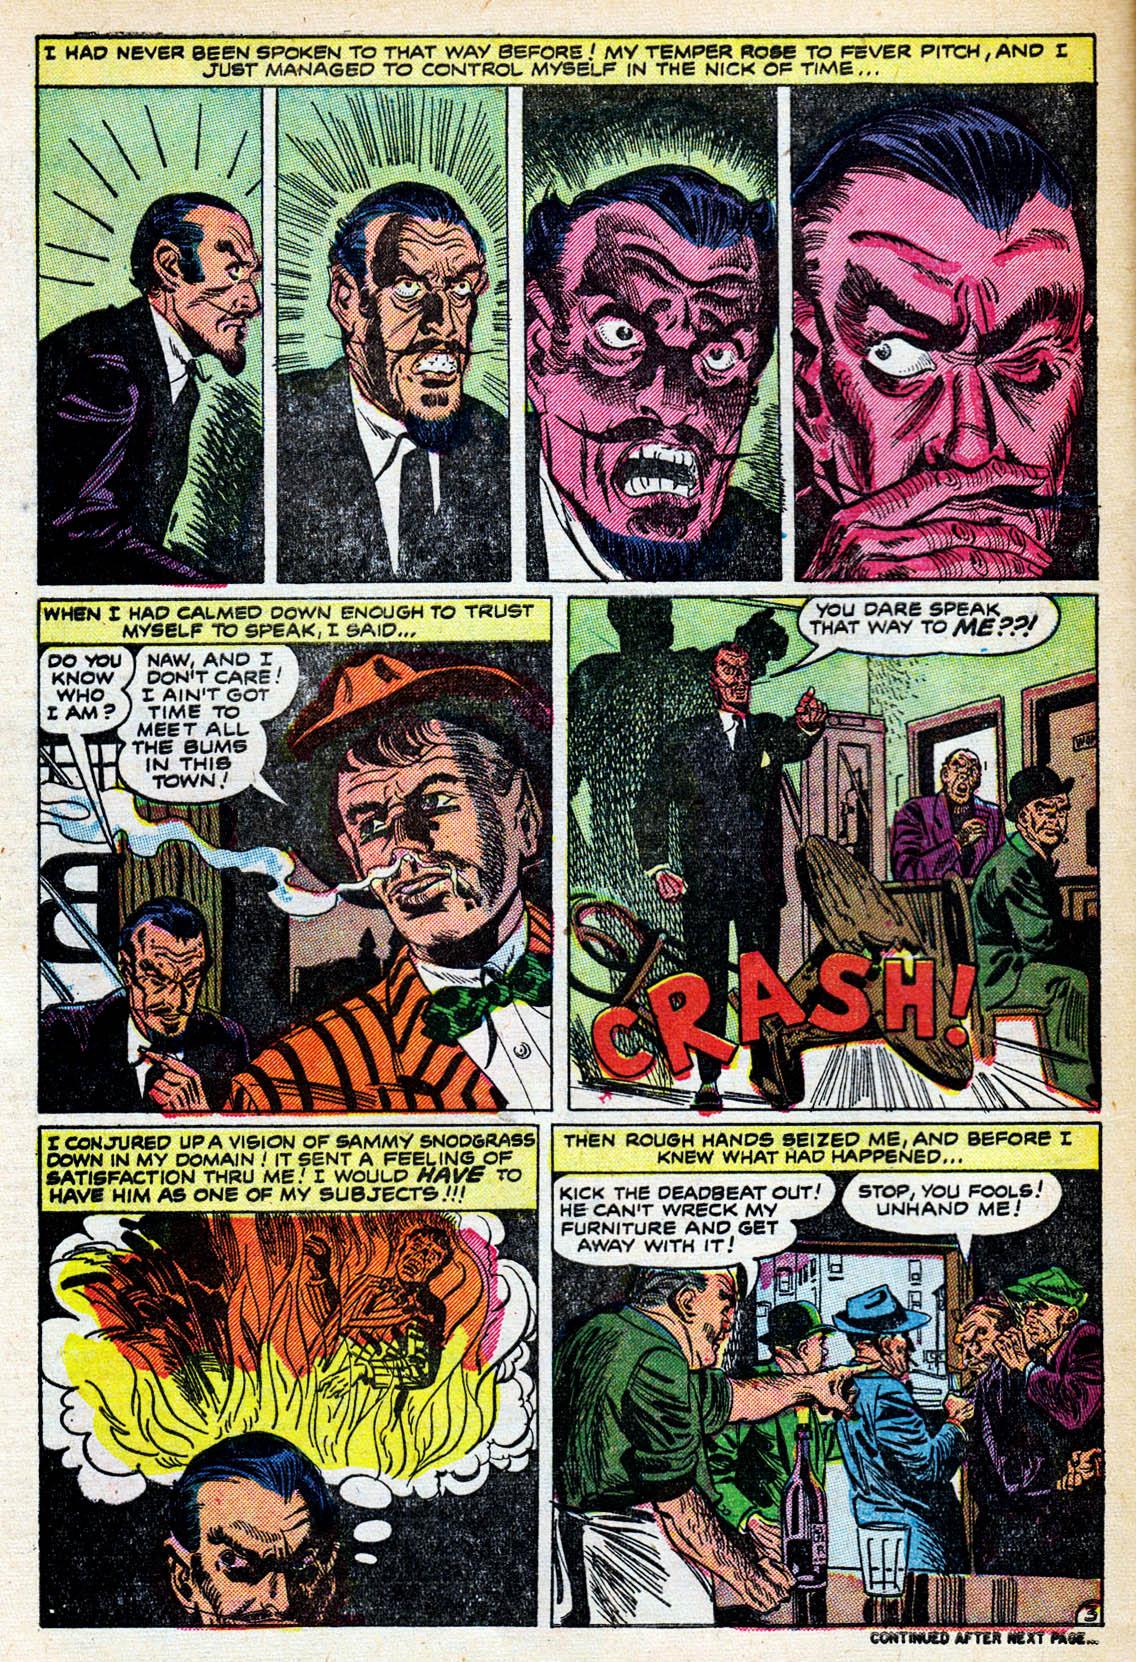 Satan and Sammy Snodgrass | Fifties Horror